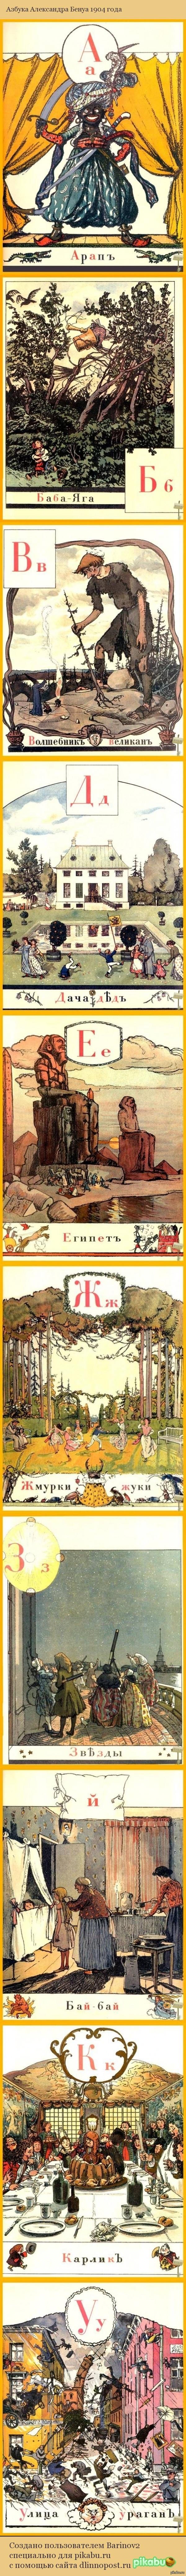 "Азбука Александра Бенуа 1904 года Похожий пост был (<a href=""http://pikabu.ru/story/kapelka_natsizma_na_pikabu_1770289)."">http://pikabu.ru/story/_1770289</a> Но там не все картинки."